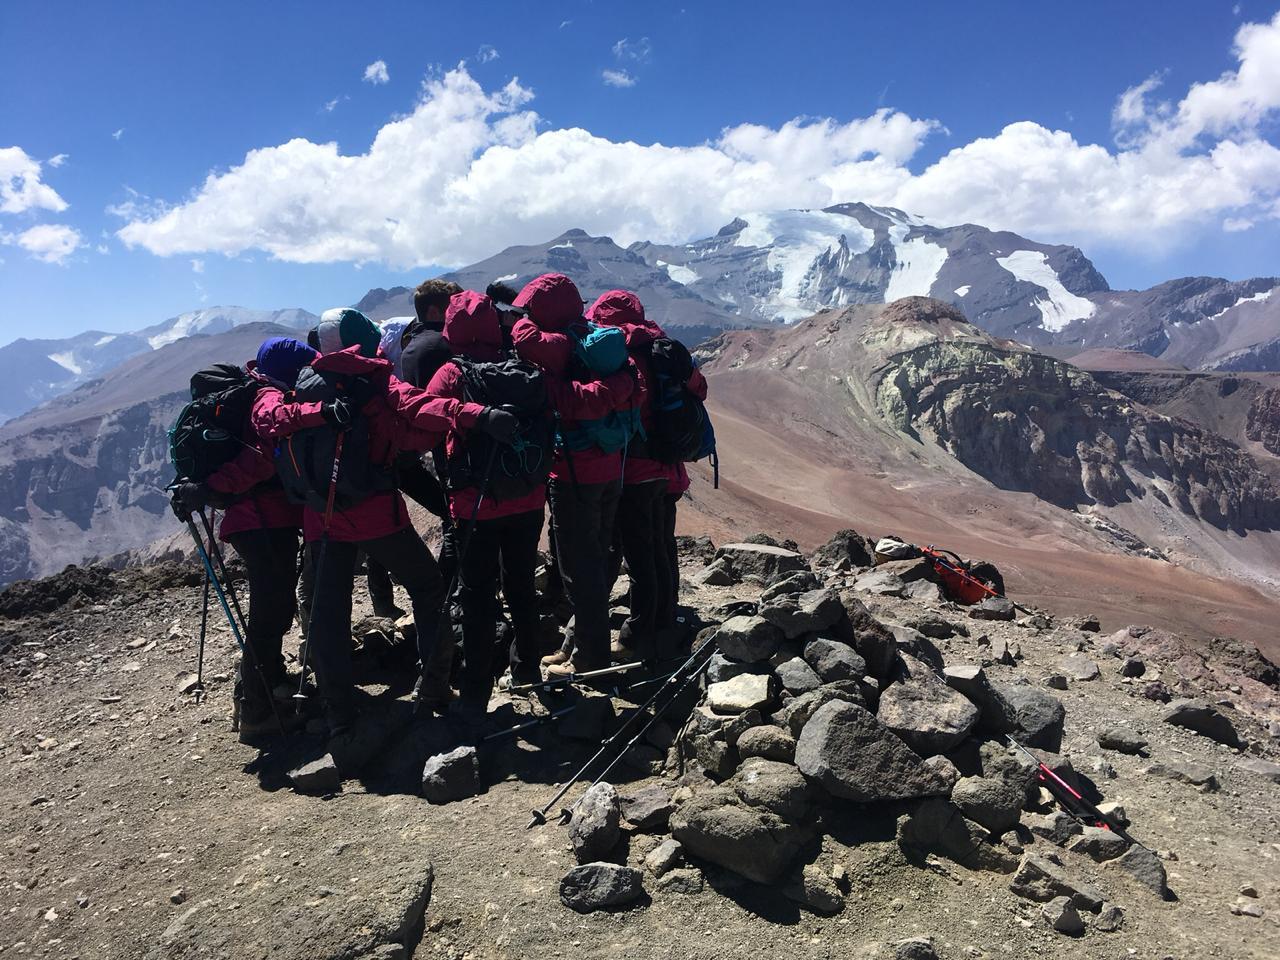 Ojos-del-Salado-Expedition-Forces-Wives-Challenge-2.jpg